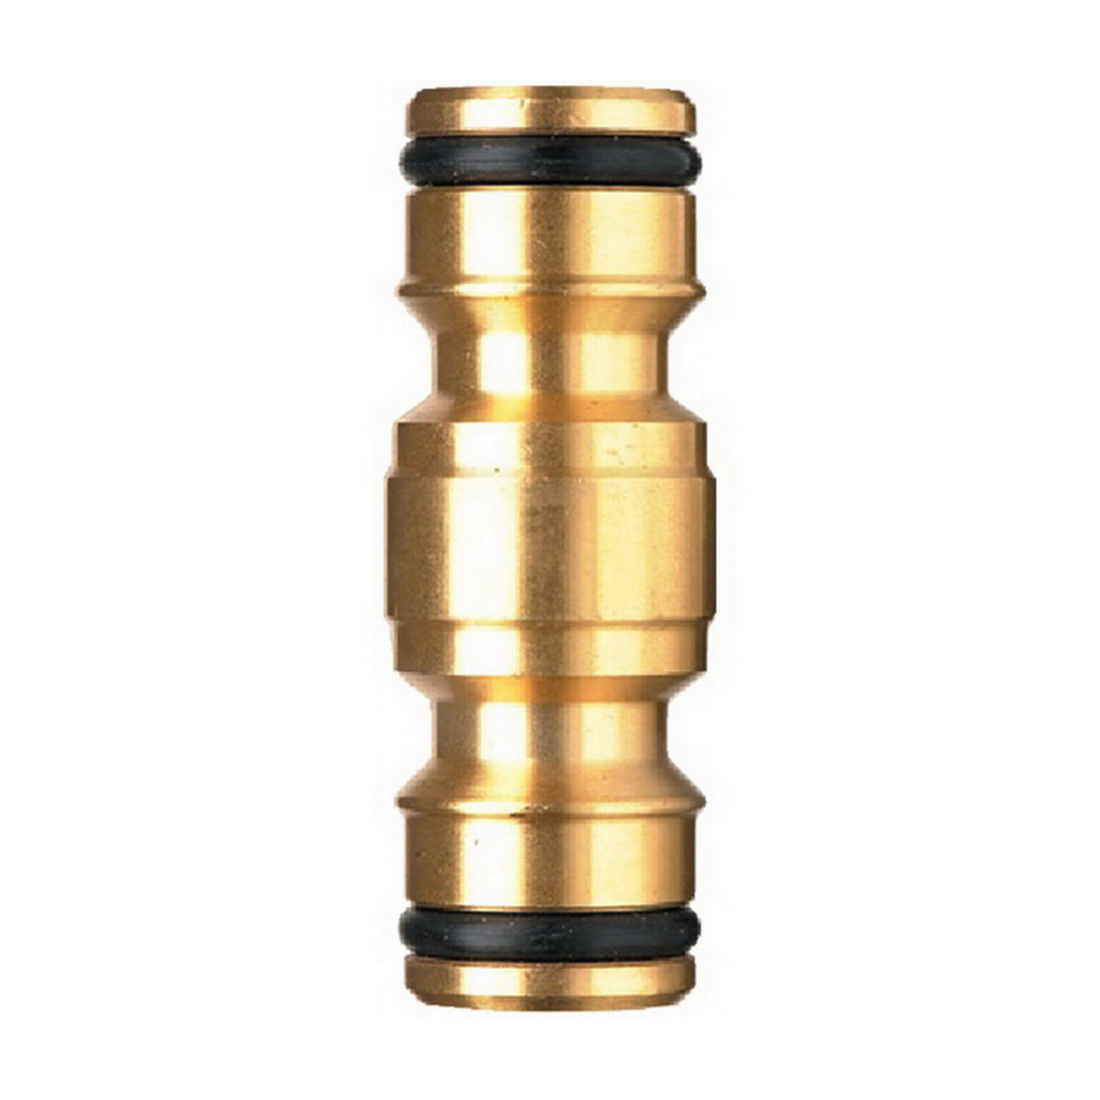 2 Way Brass Hose Adaptor 12mm Connection